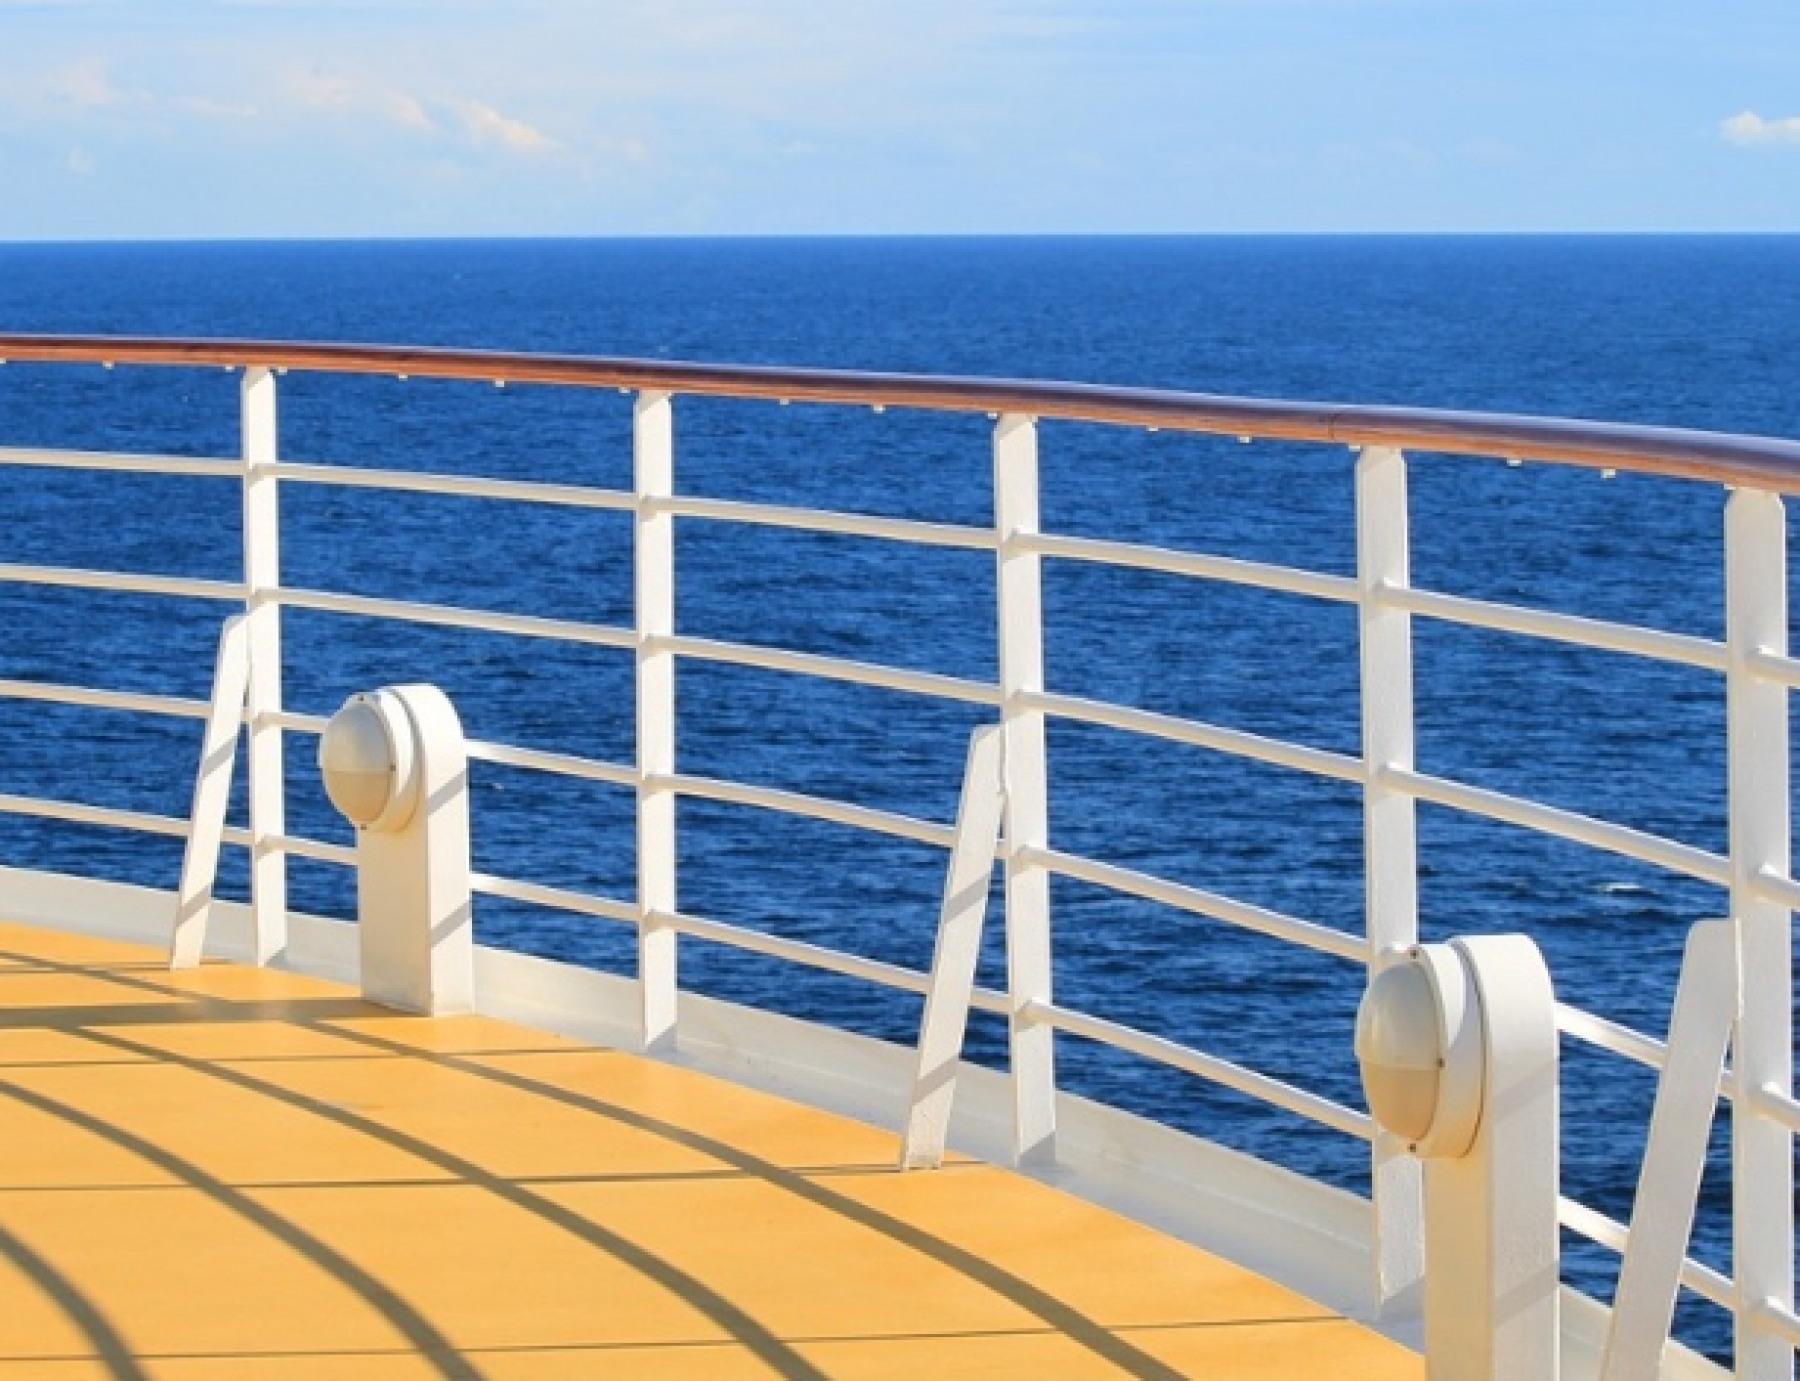 Carnival Cruise Lines Carnival Dream Interiorlibrary-1.jpg